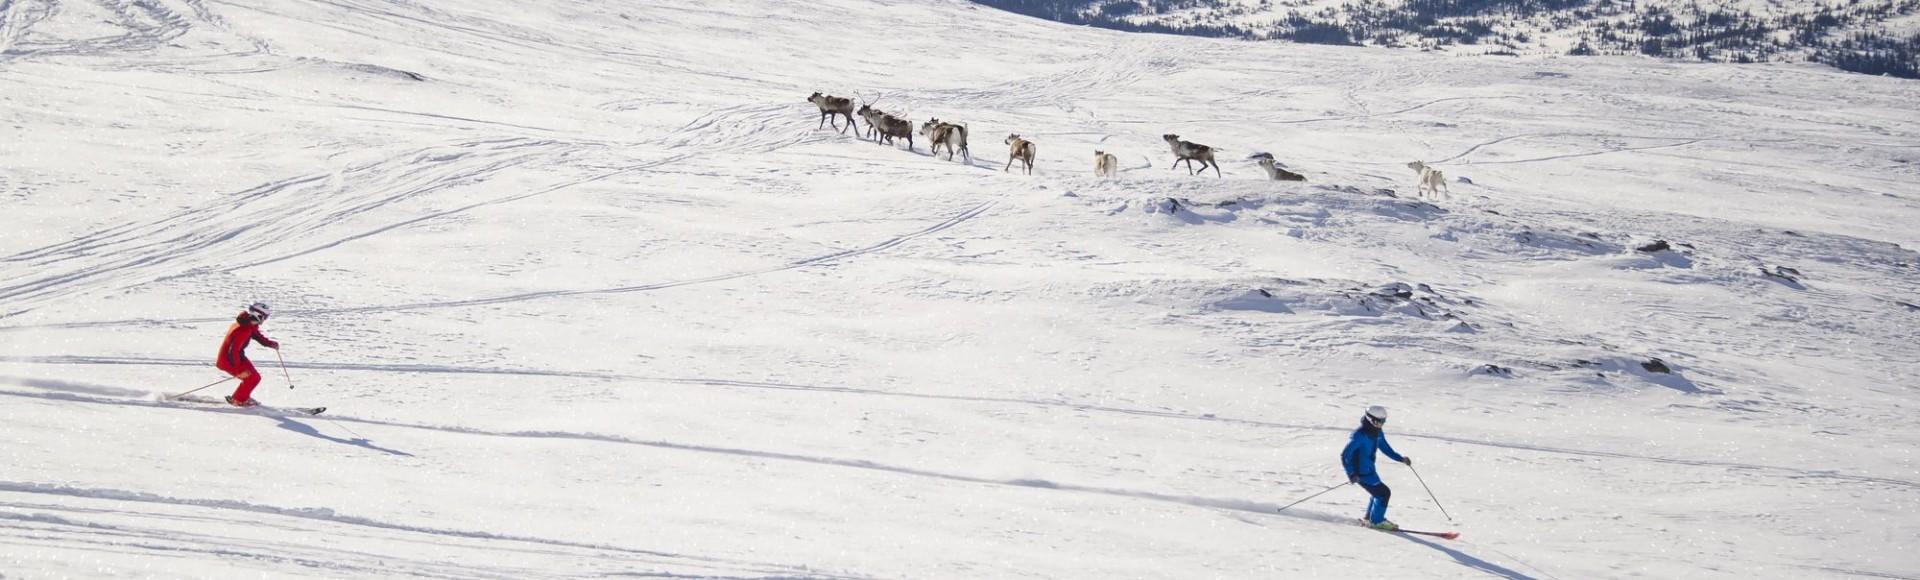 Accomodation Offer: Book Your Ski Holidays in Åre